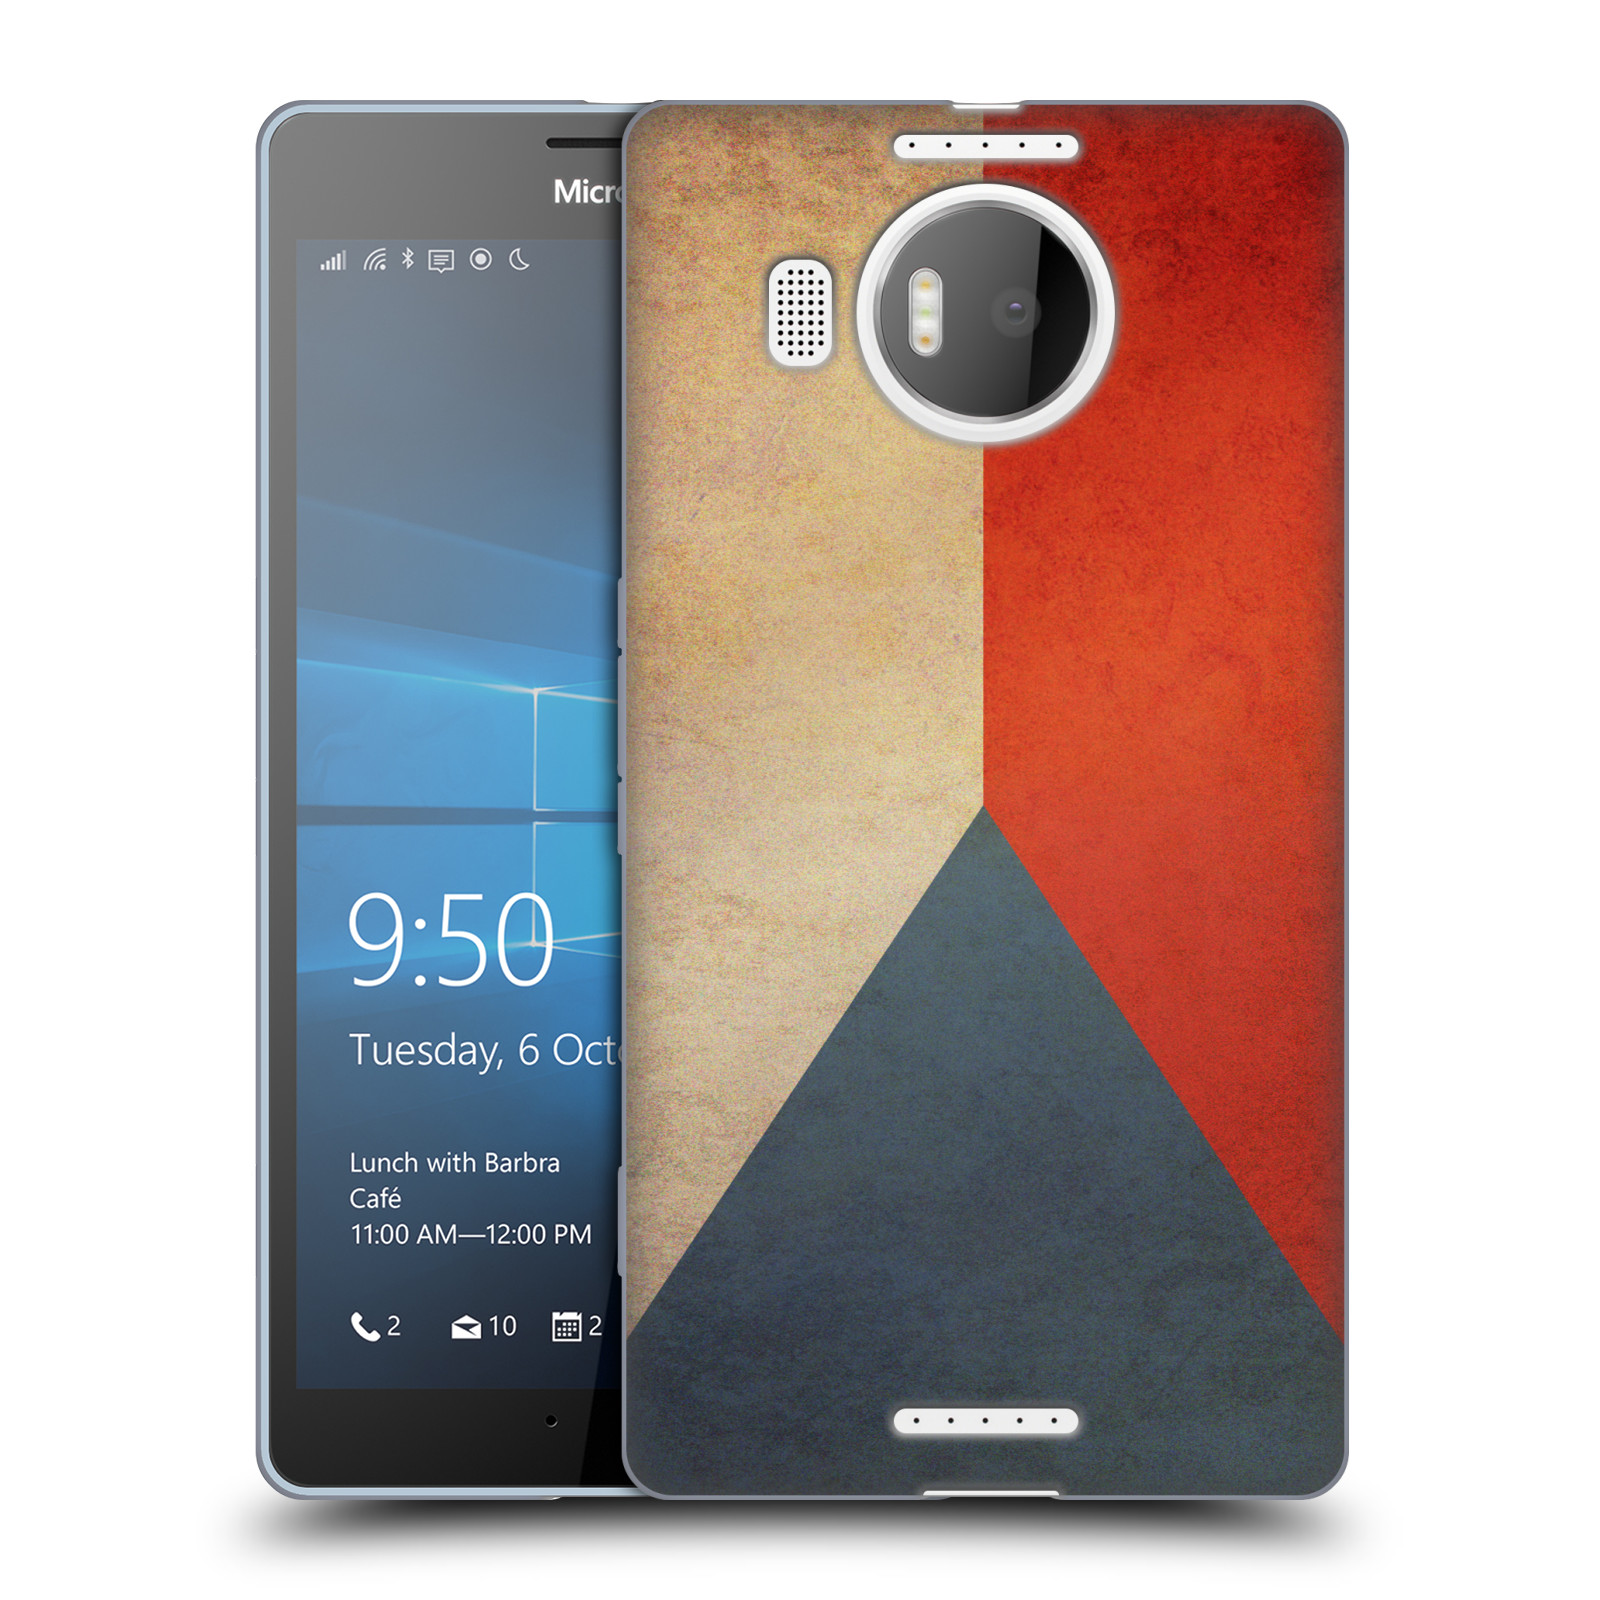 Silikonové pouzdro na mobil Microsoft Lumia 950 XL HEAD CASE VLAJKA ČESKÁ REPUBLIKA